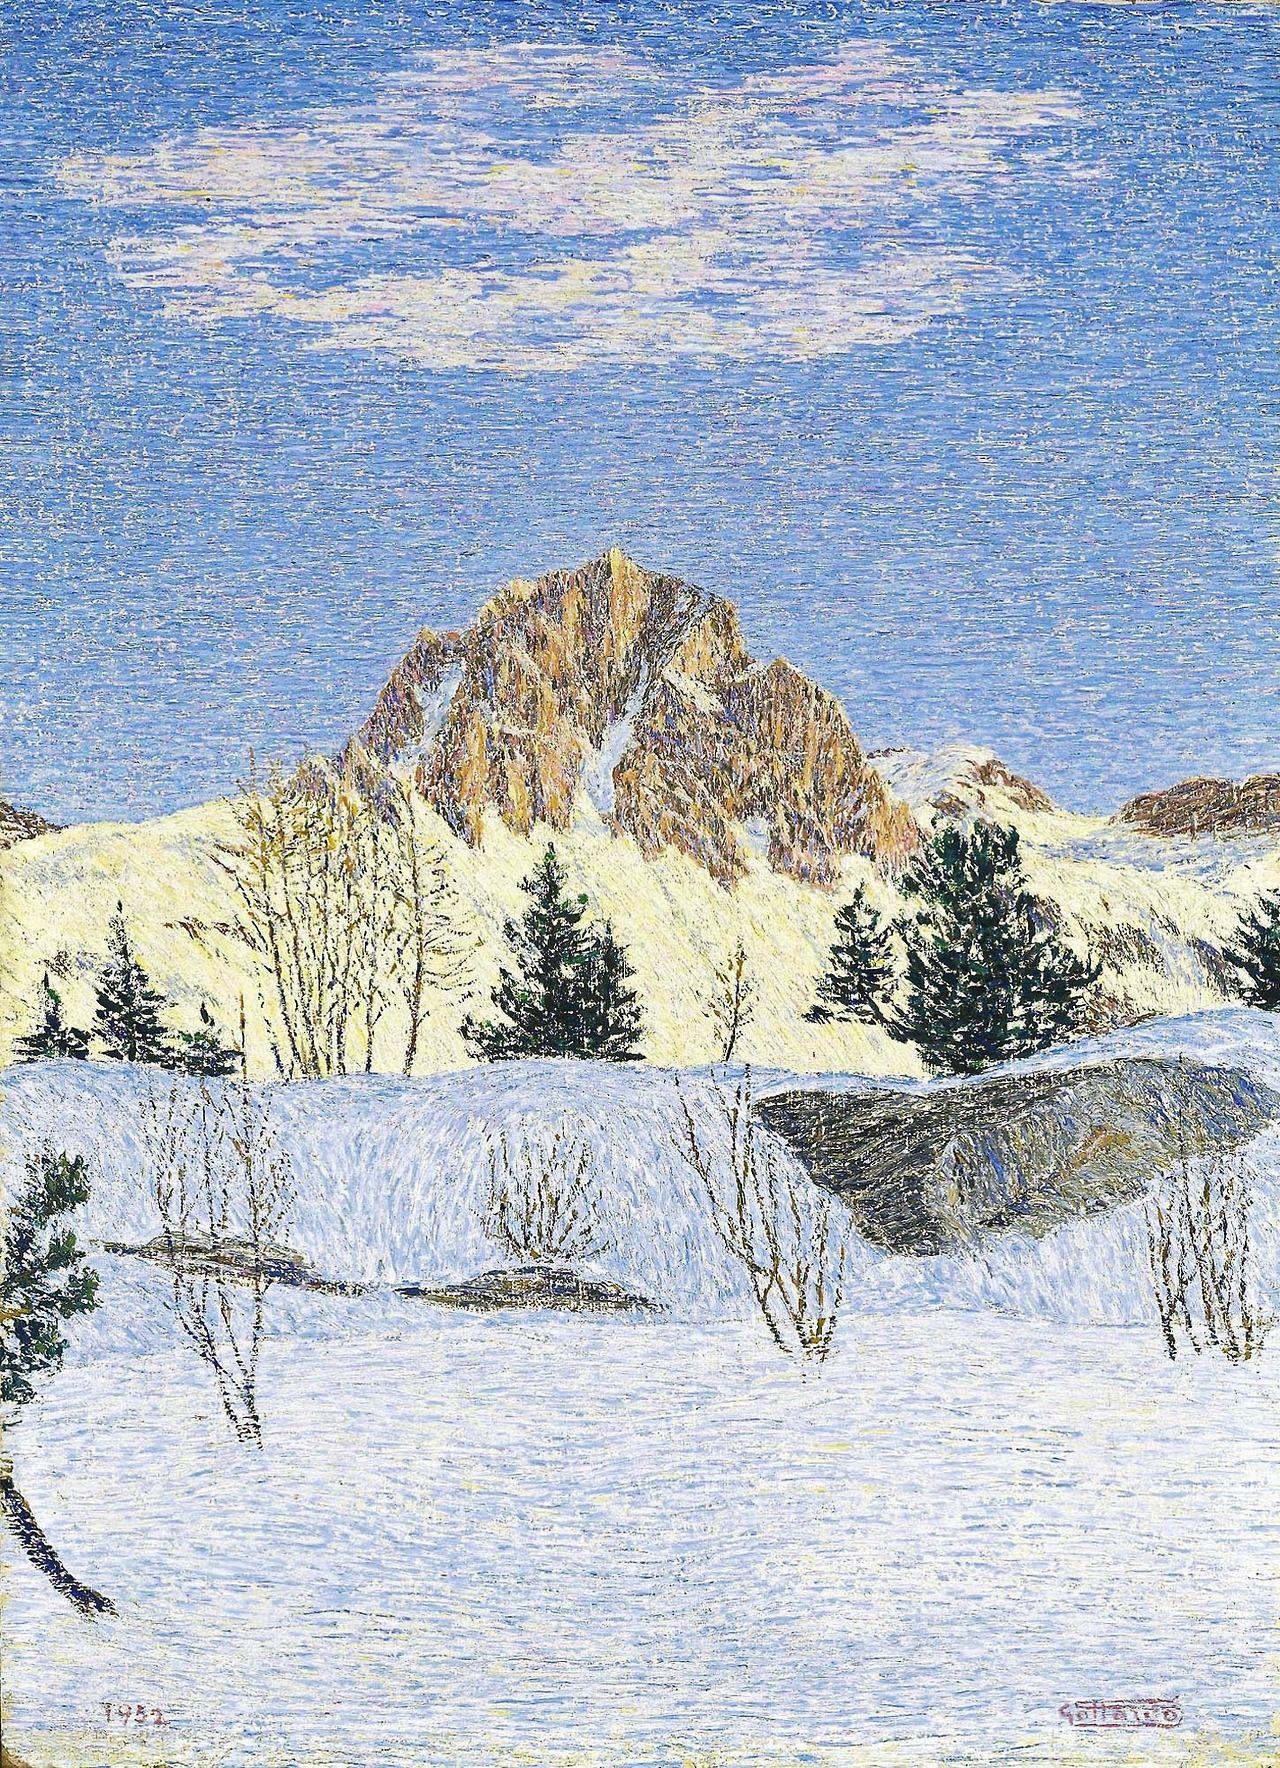 Gottardo Segantini (Swiss, 1882-1974), Winter landscape, 1952. Oil on board, 58.5 x 42.5 cm.